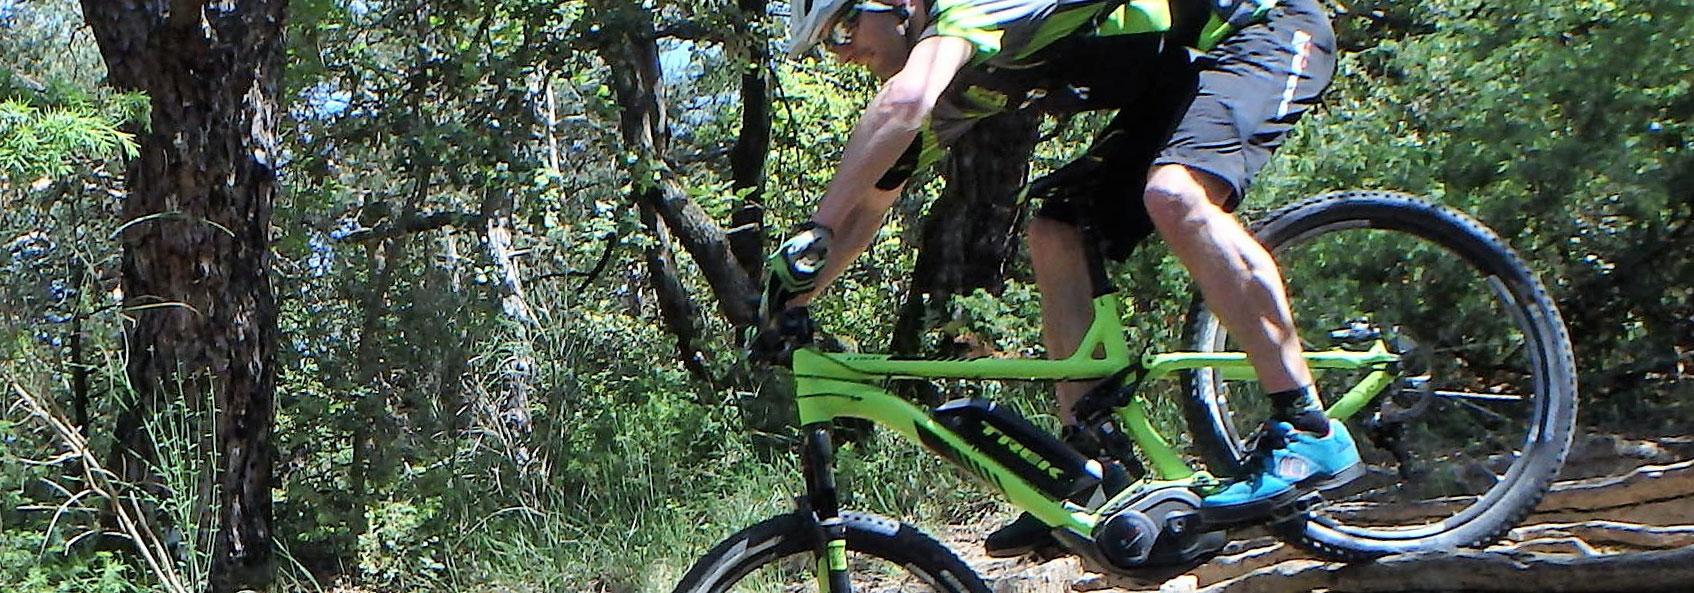 mtbclinic.nl mountainbike clinics emtb